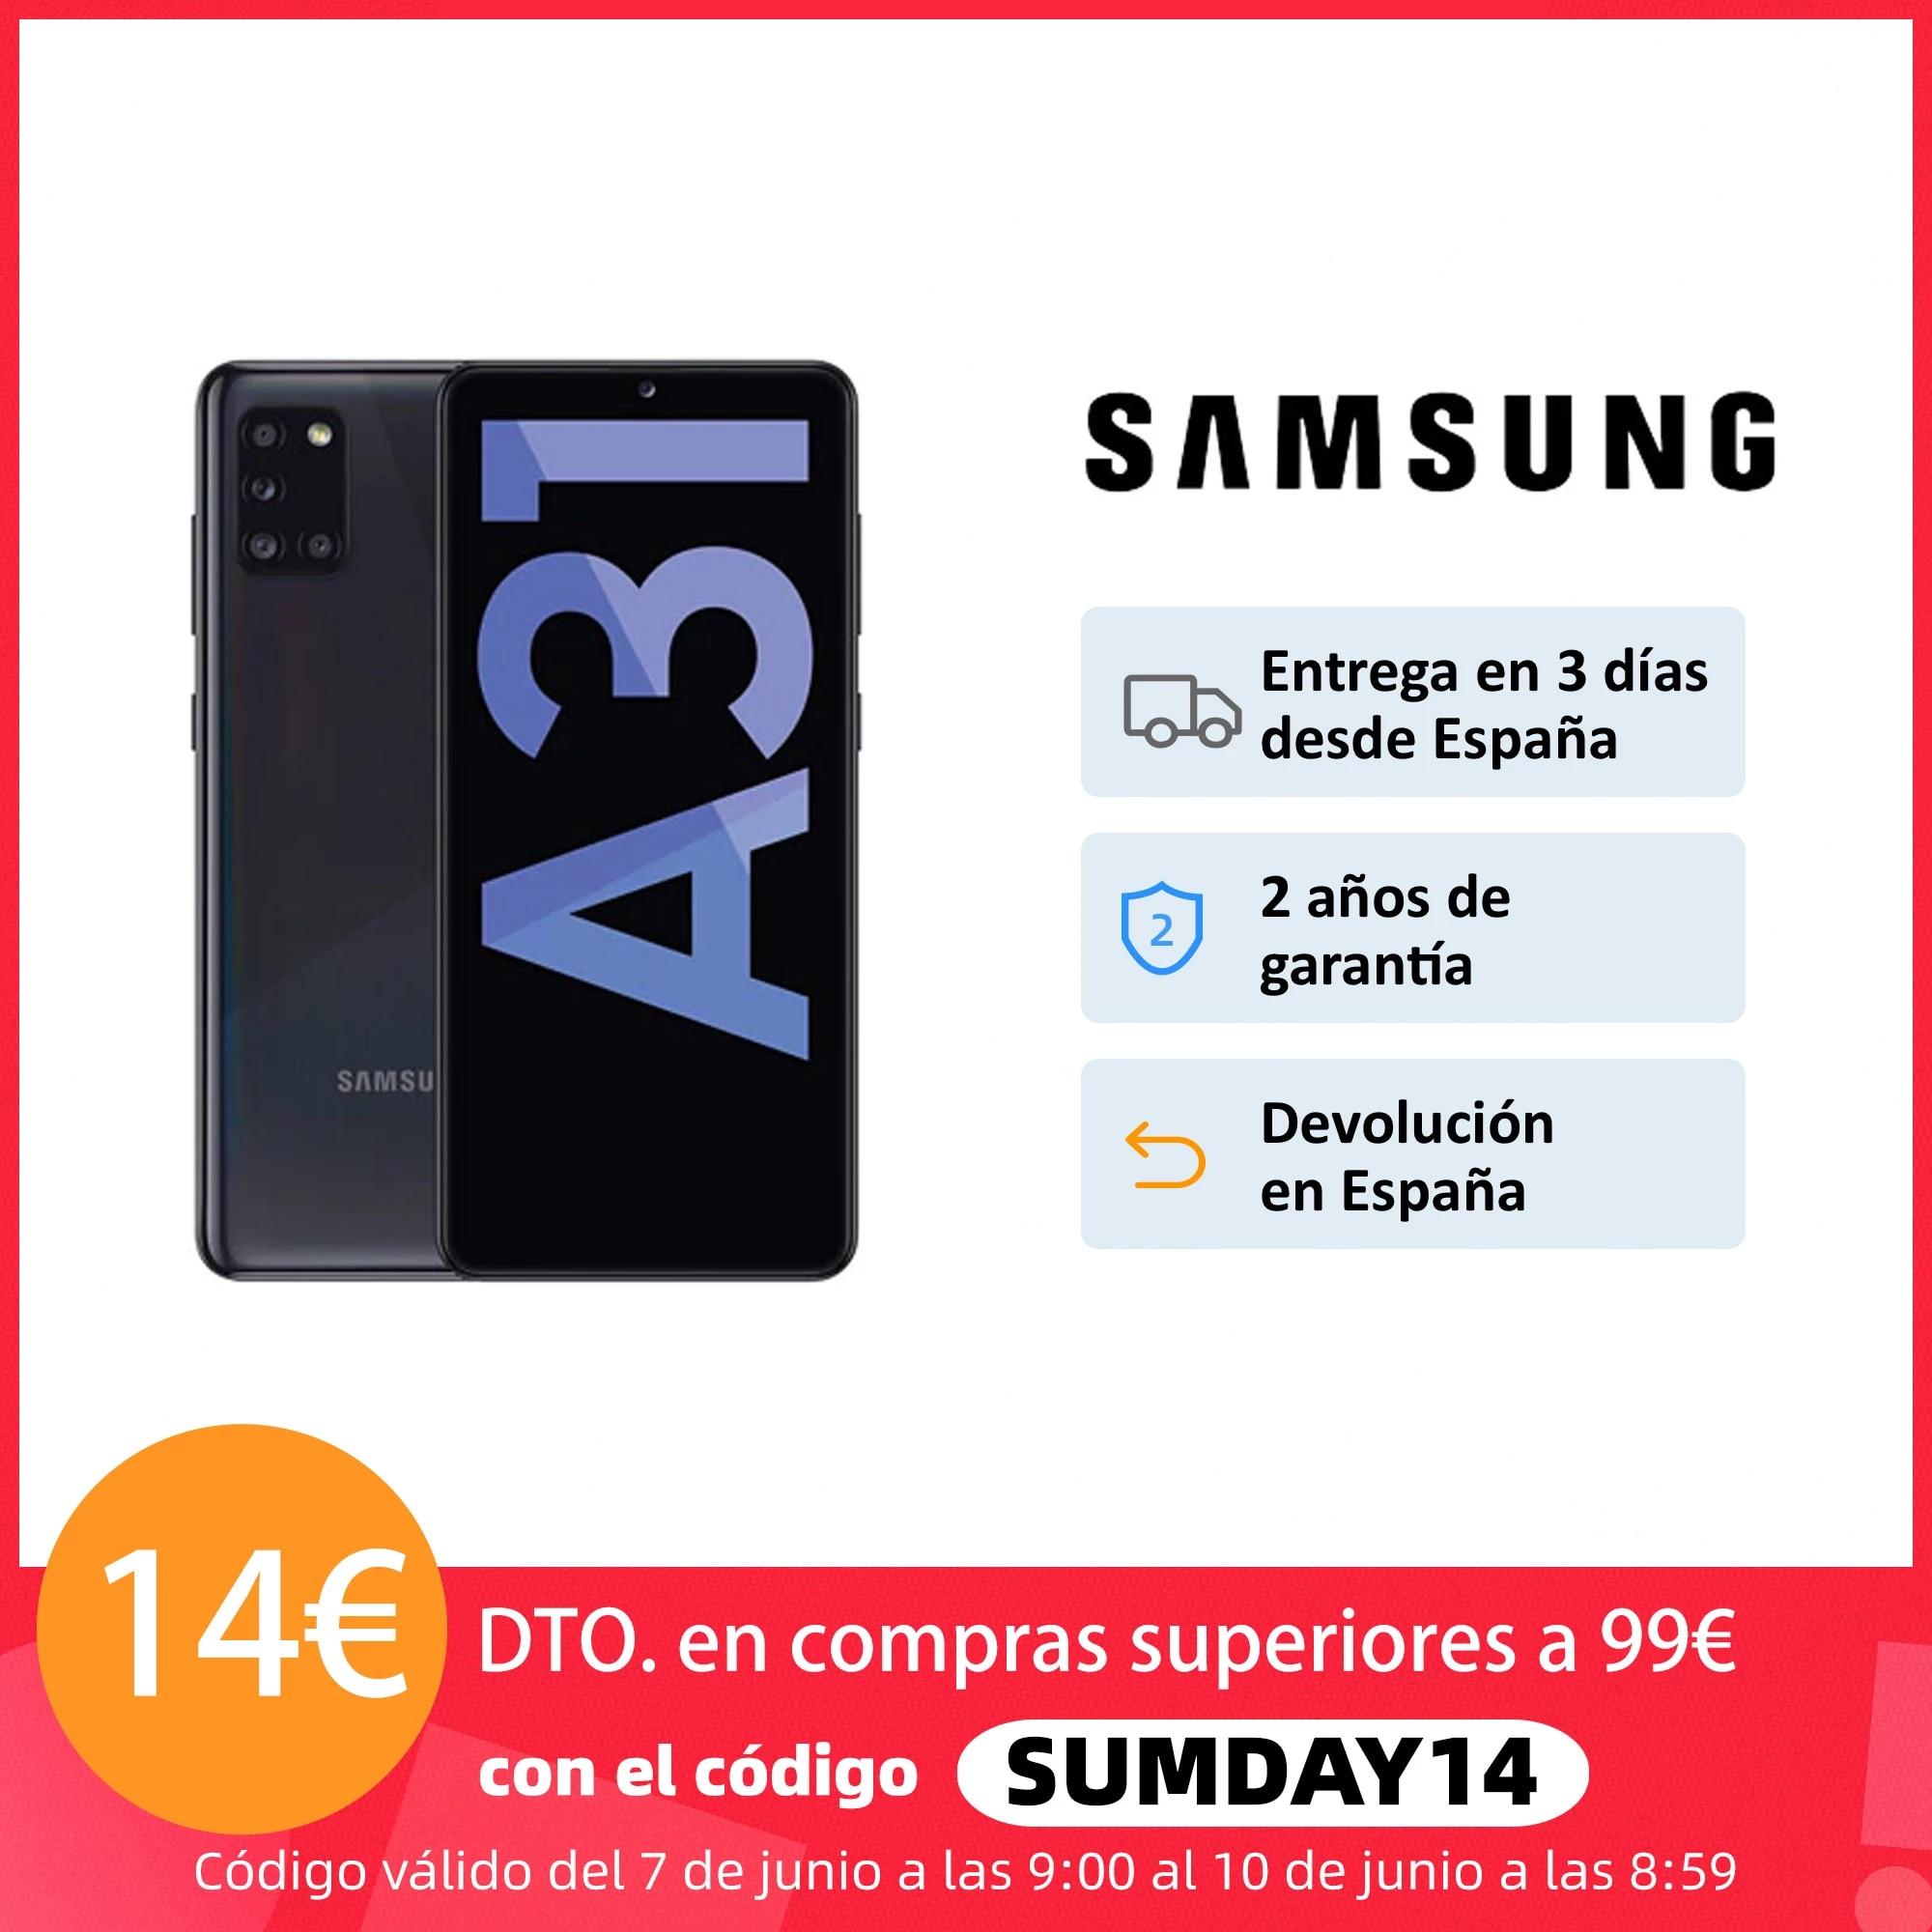 Samsung Galaxy A31 Android smartphone, 4GB + 64/128GB, 6,4 «FHD + screen, 5000 mAh battery, 4 cameras, Octa-core, Samsung Knox»